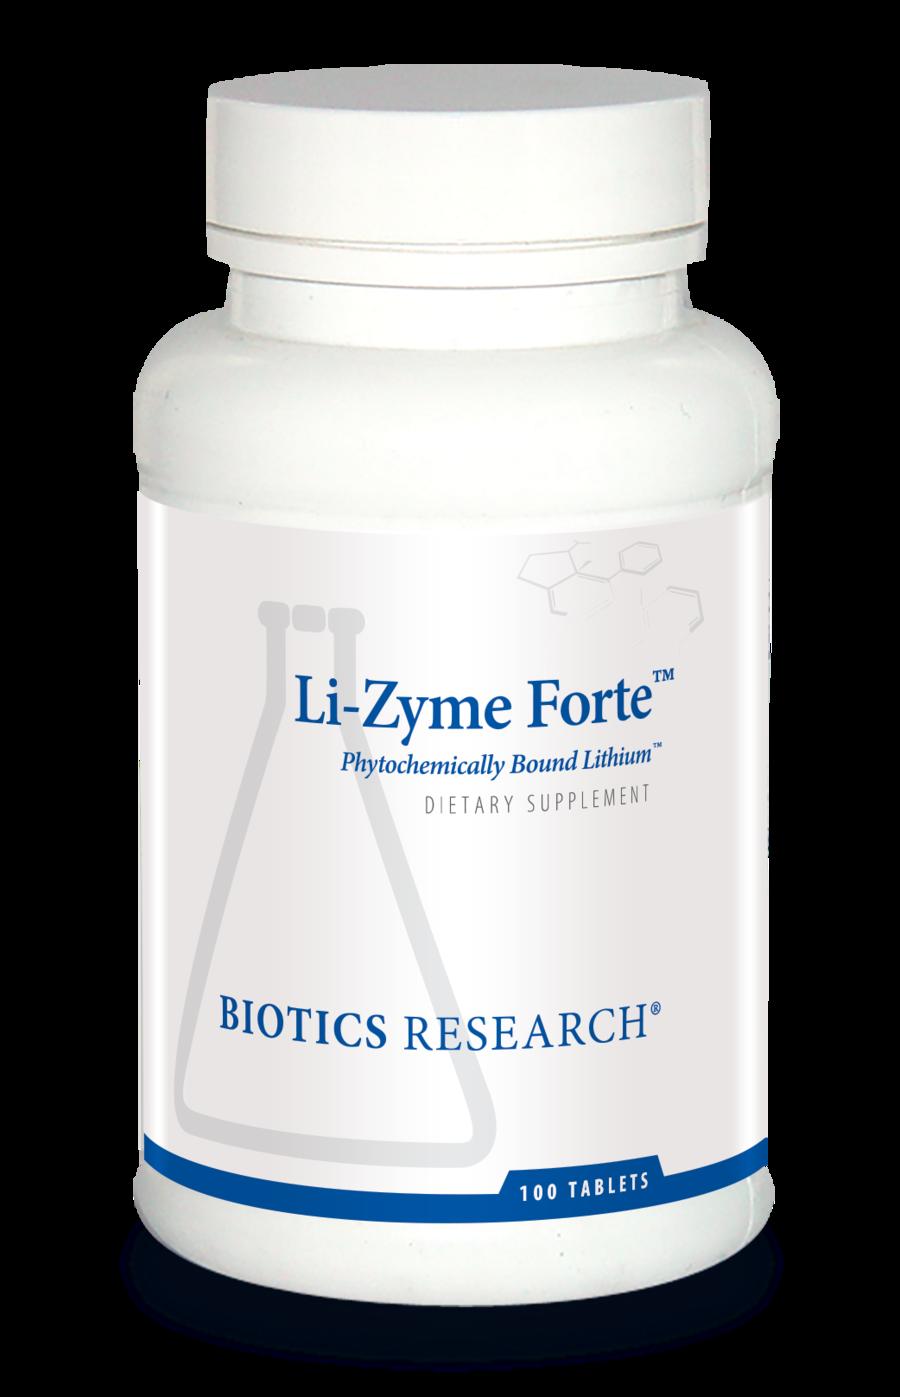 Li-Zyme Forte